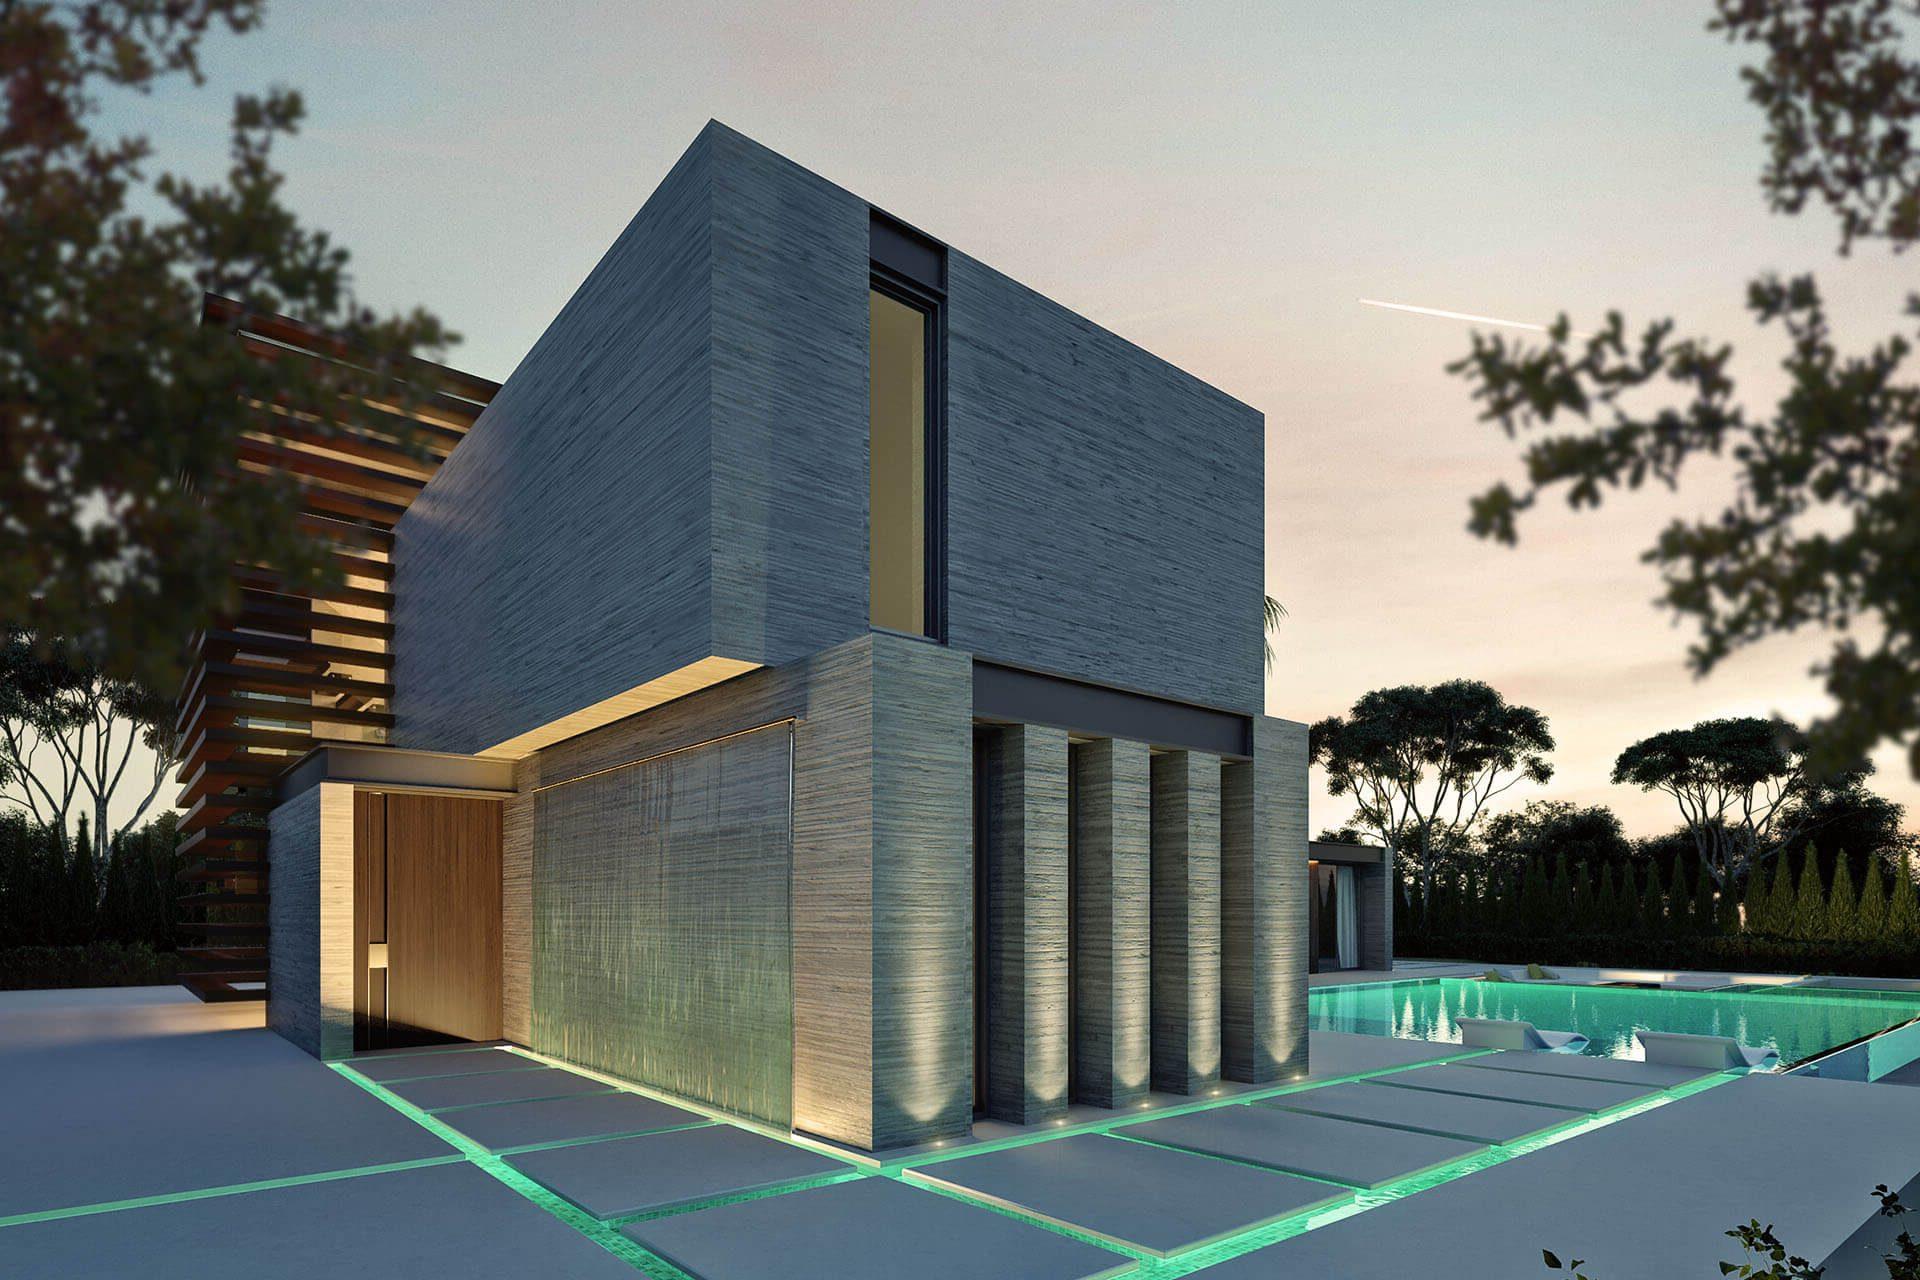 Villa 408 - archidomstudio.com